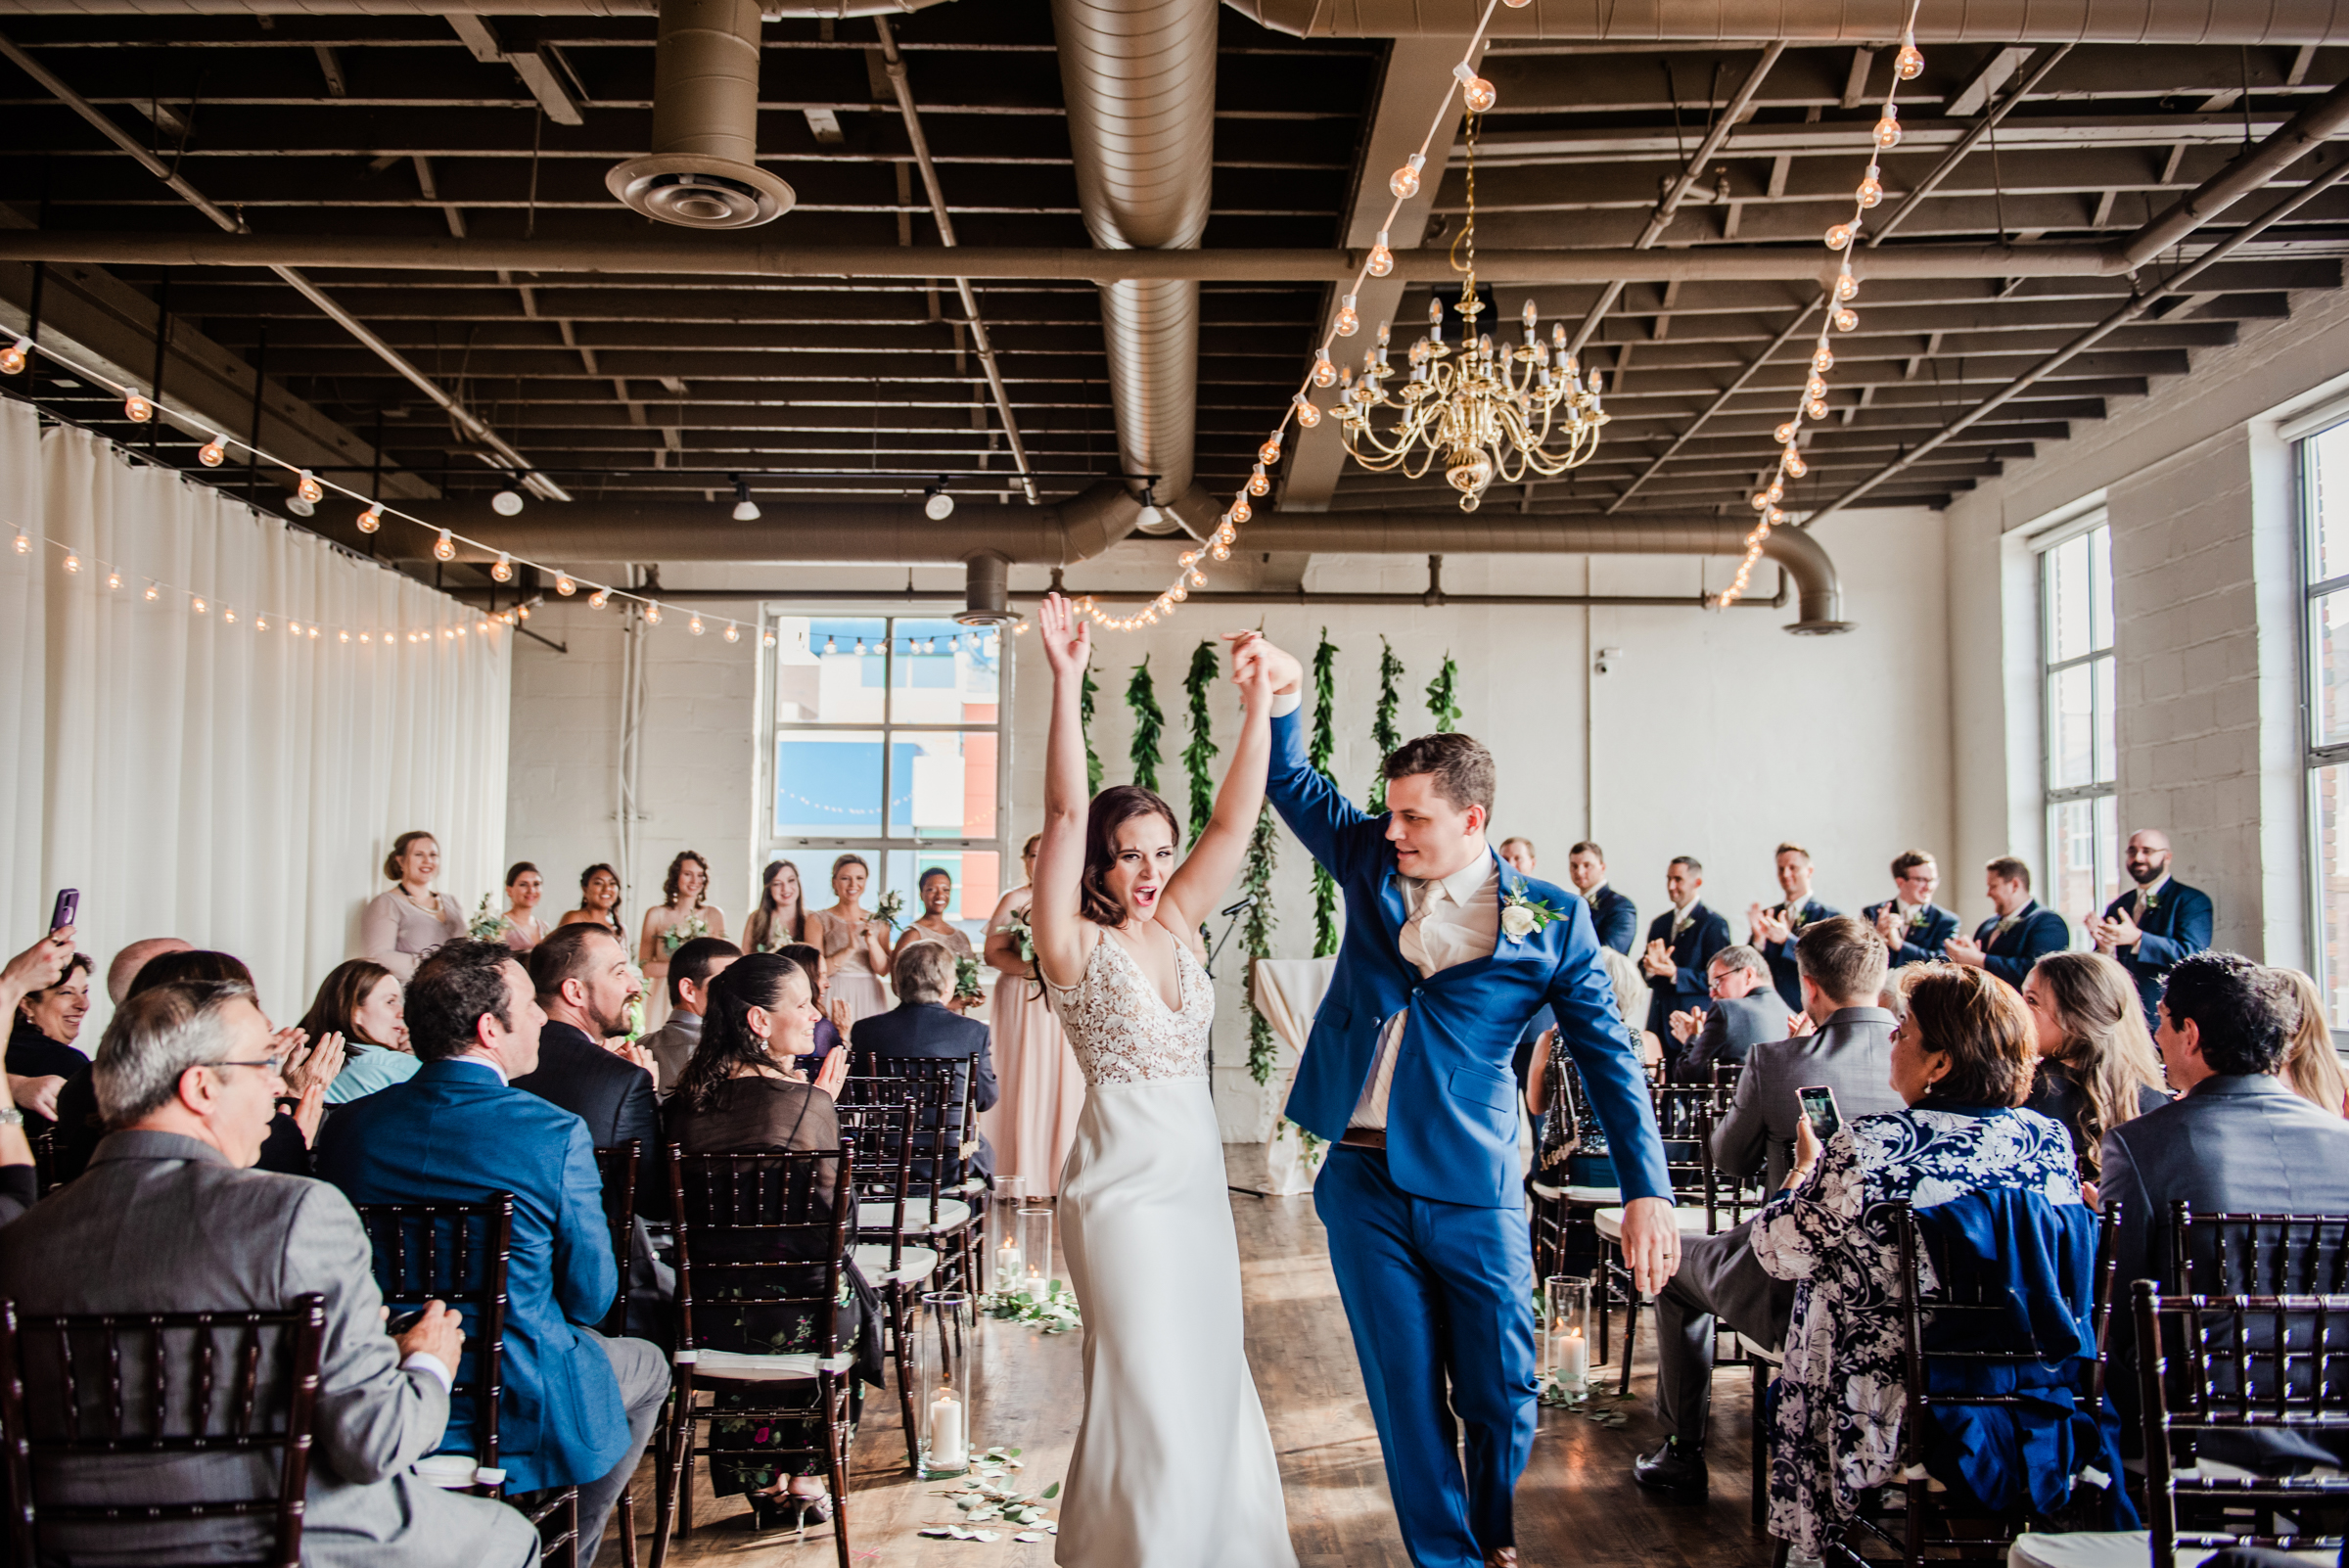 The_Arbor_LoftRochester_Wedding_JILL_STUDIO_Rochester_NY_Photographer_171713.jpg